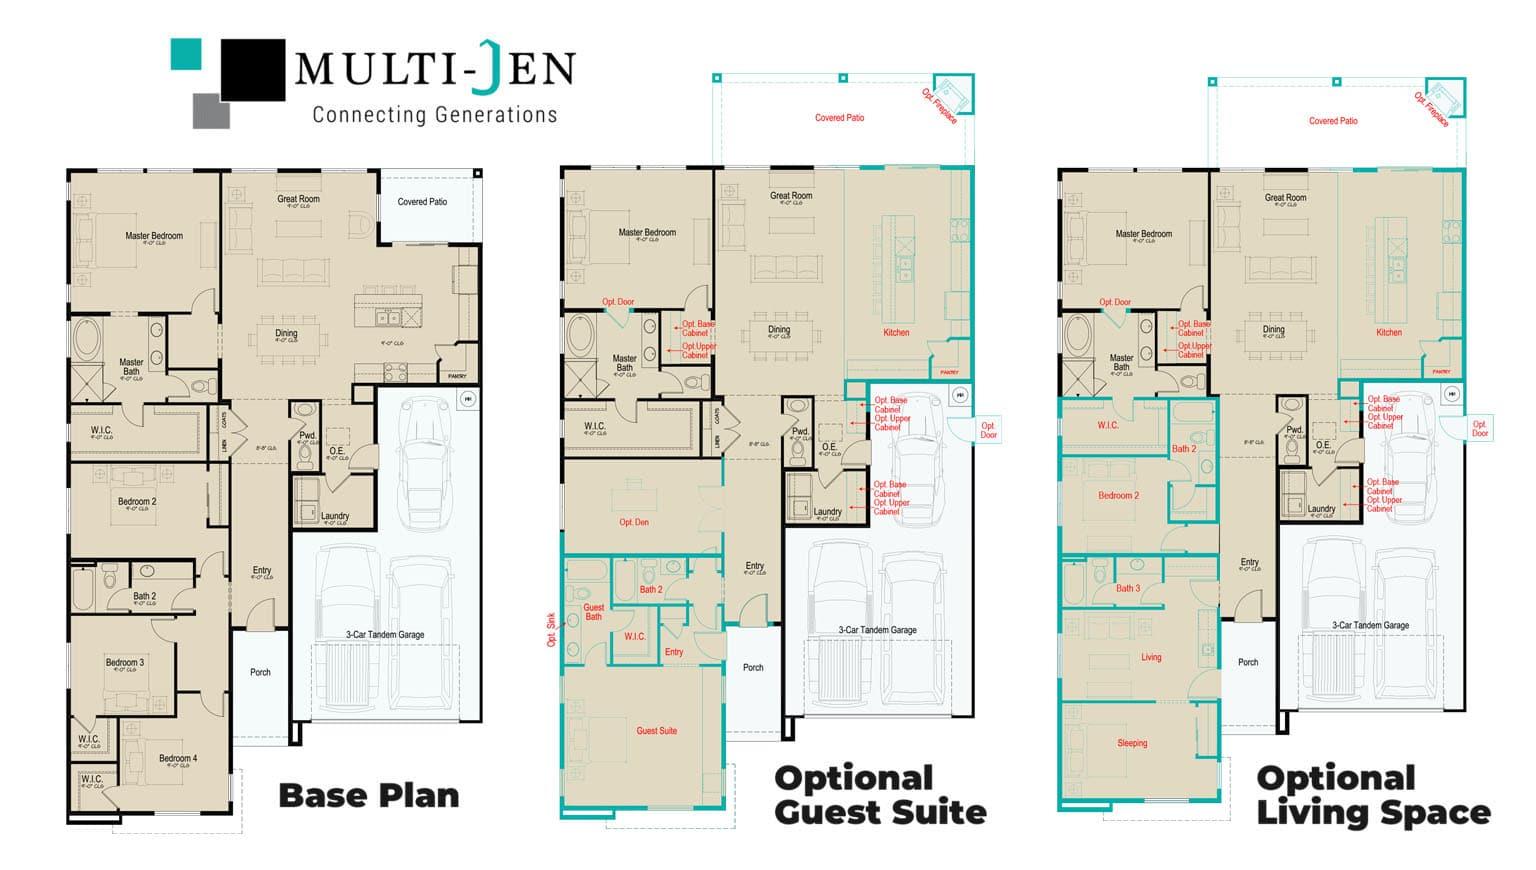 new-homes-spanish-springs-blackstone-floorplan5-2125-mulit-jen-8-2-21